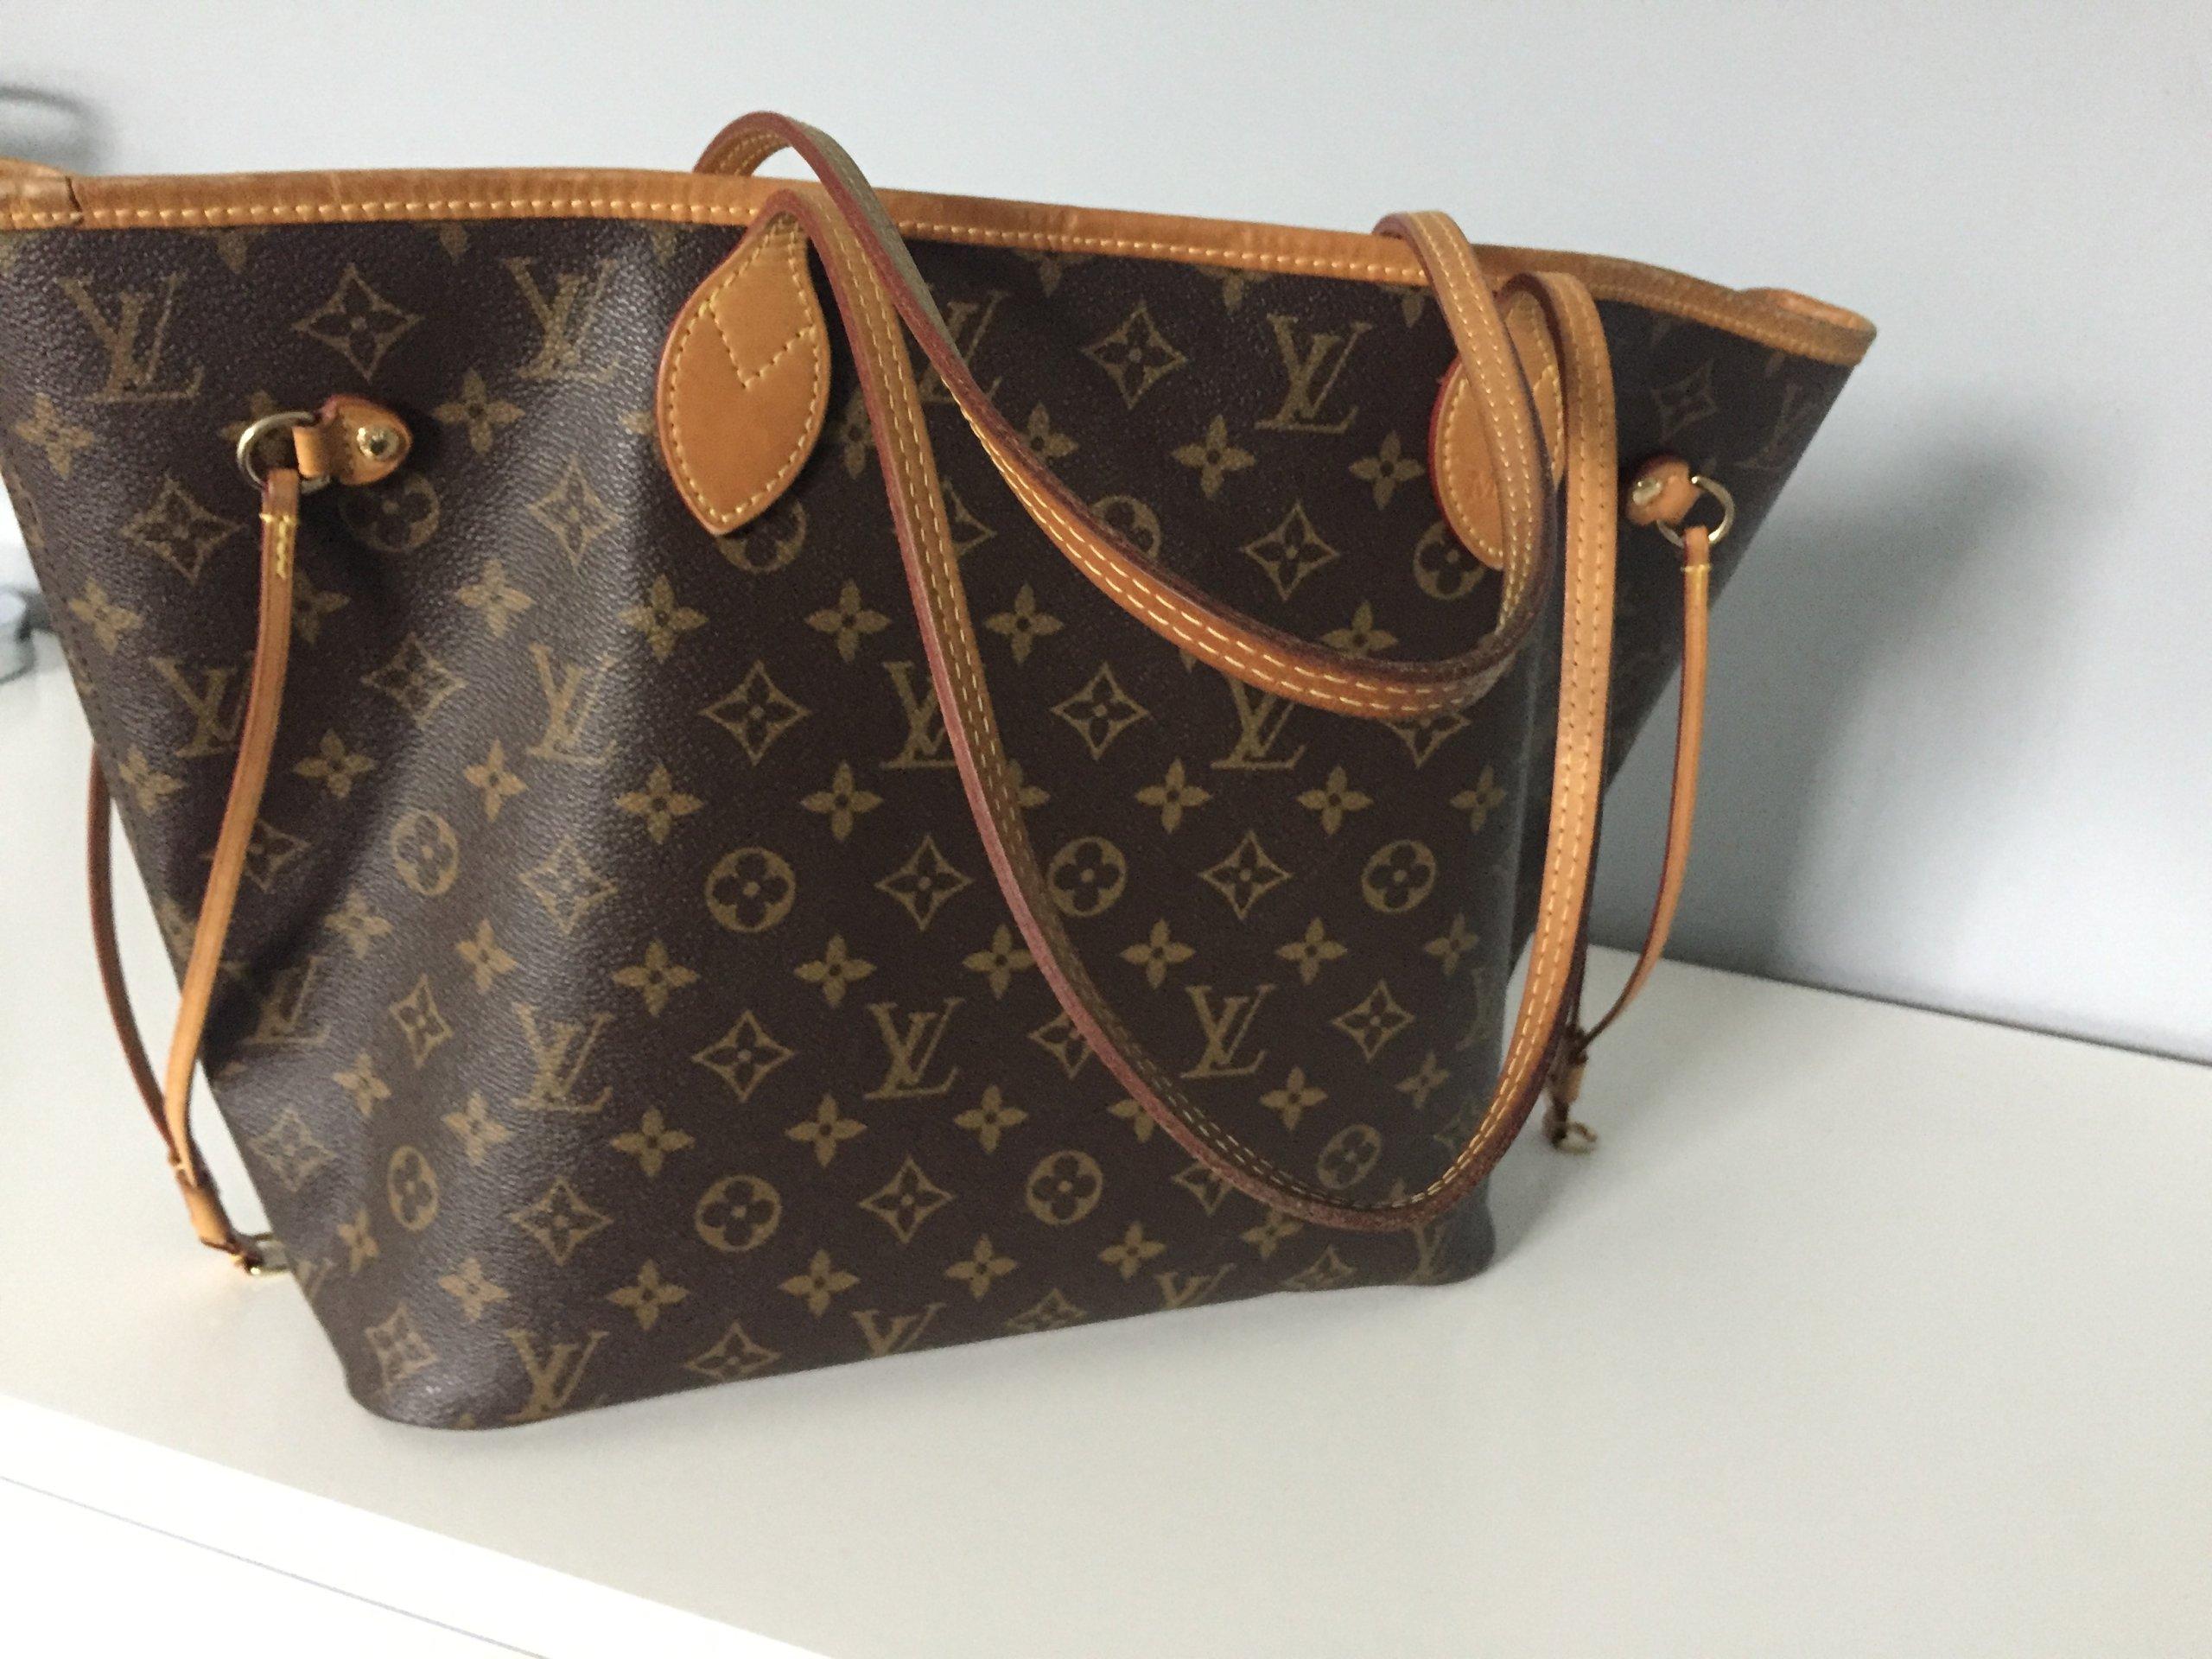 59fe8589a3e9c ORYGINAŁ Louis Vuitton Neverfull GM Monogram - 7007843433 ...